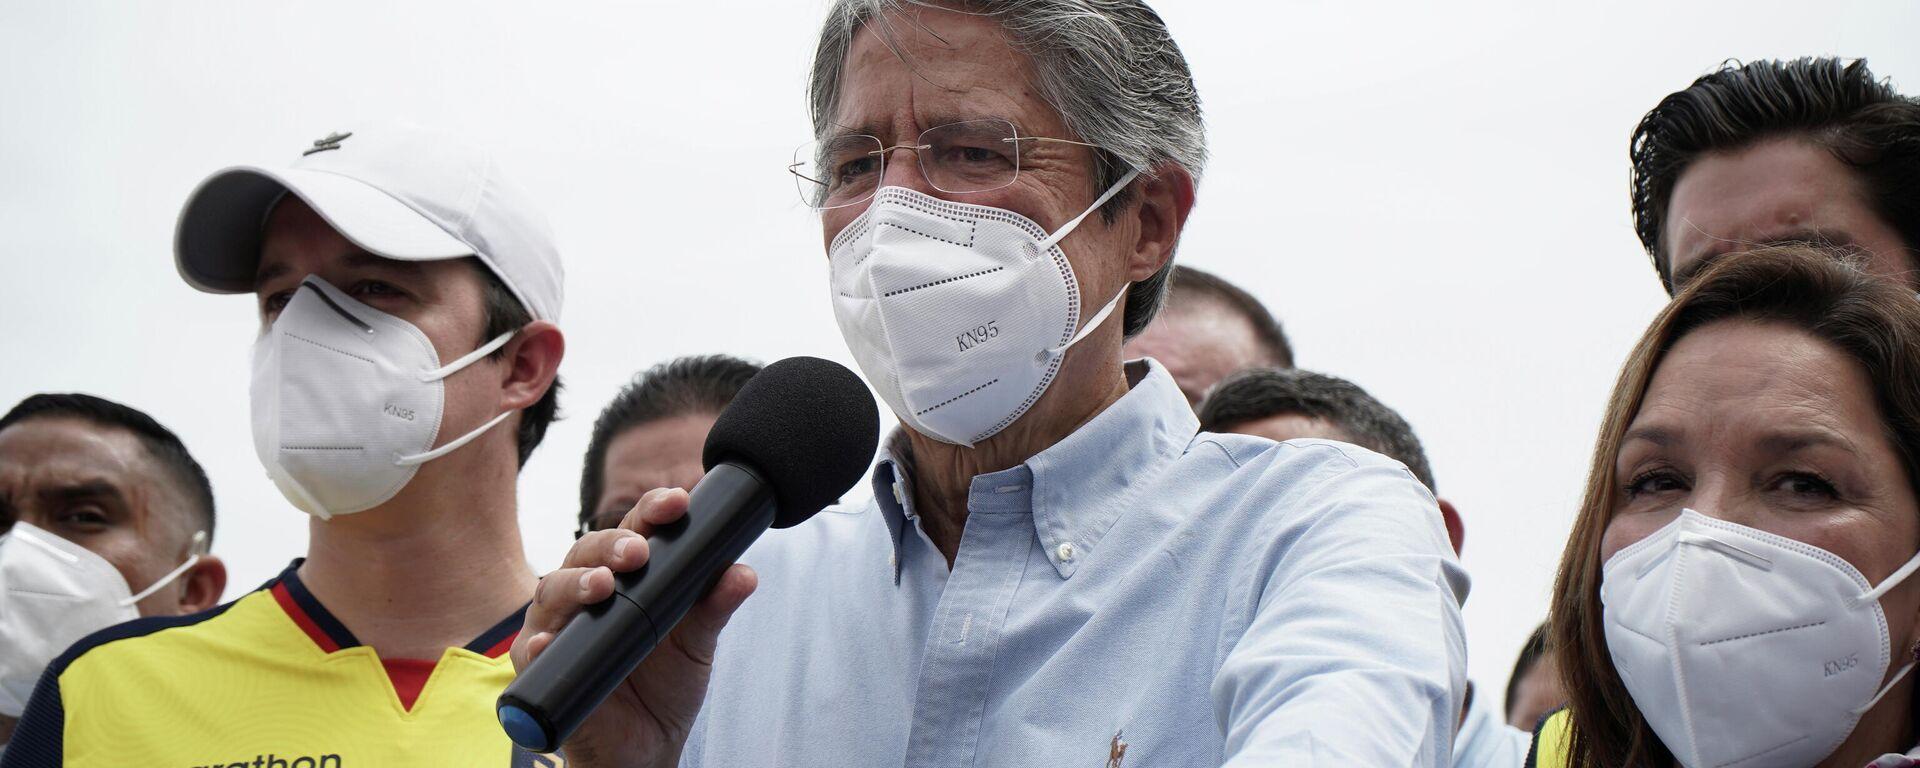 Guillermo Lasso, candidato presidencial de derecha de Ecuador - Sputnik Mundo, 1920, 11.05.2021